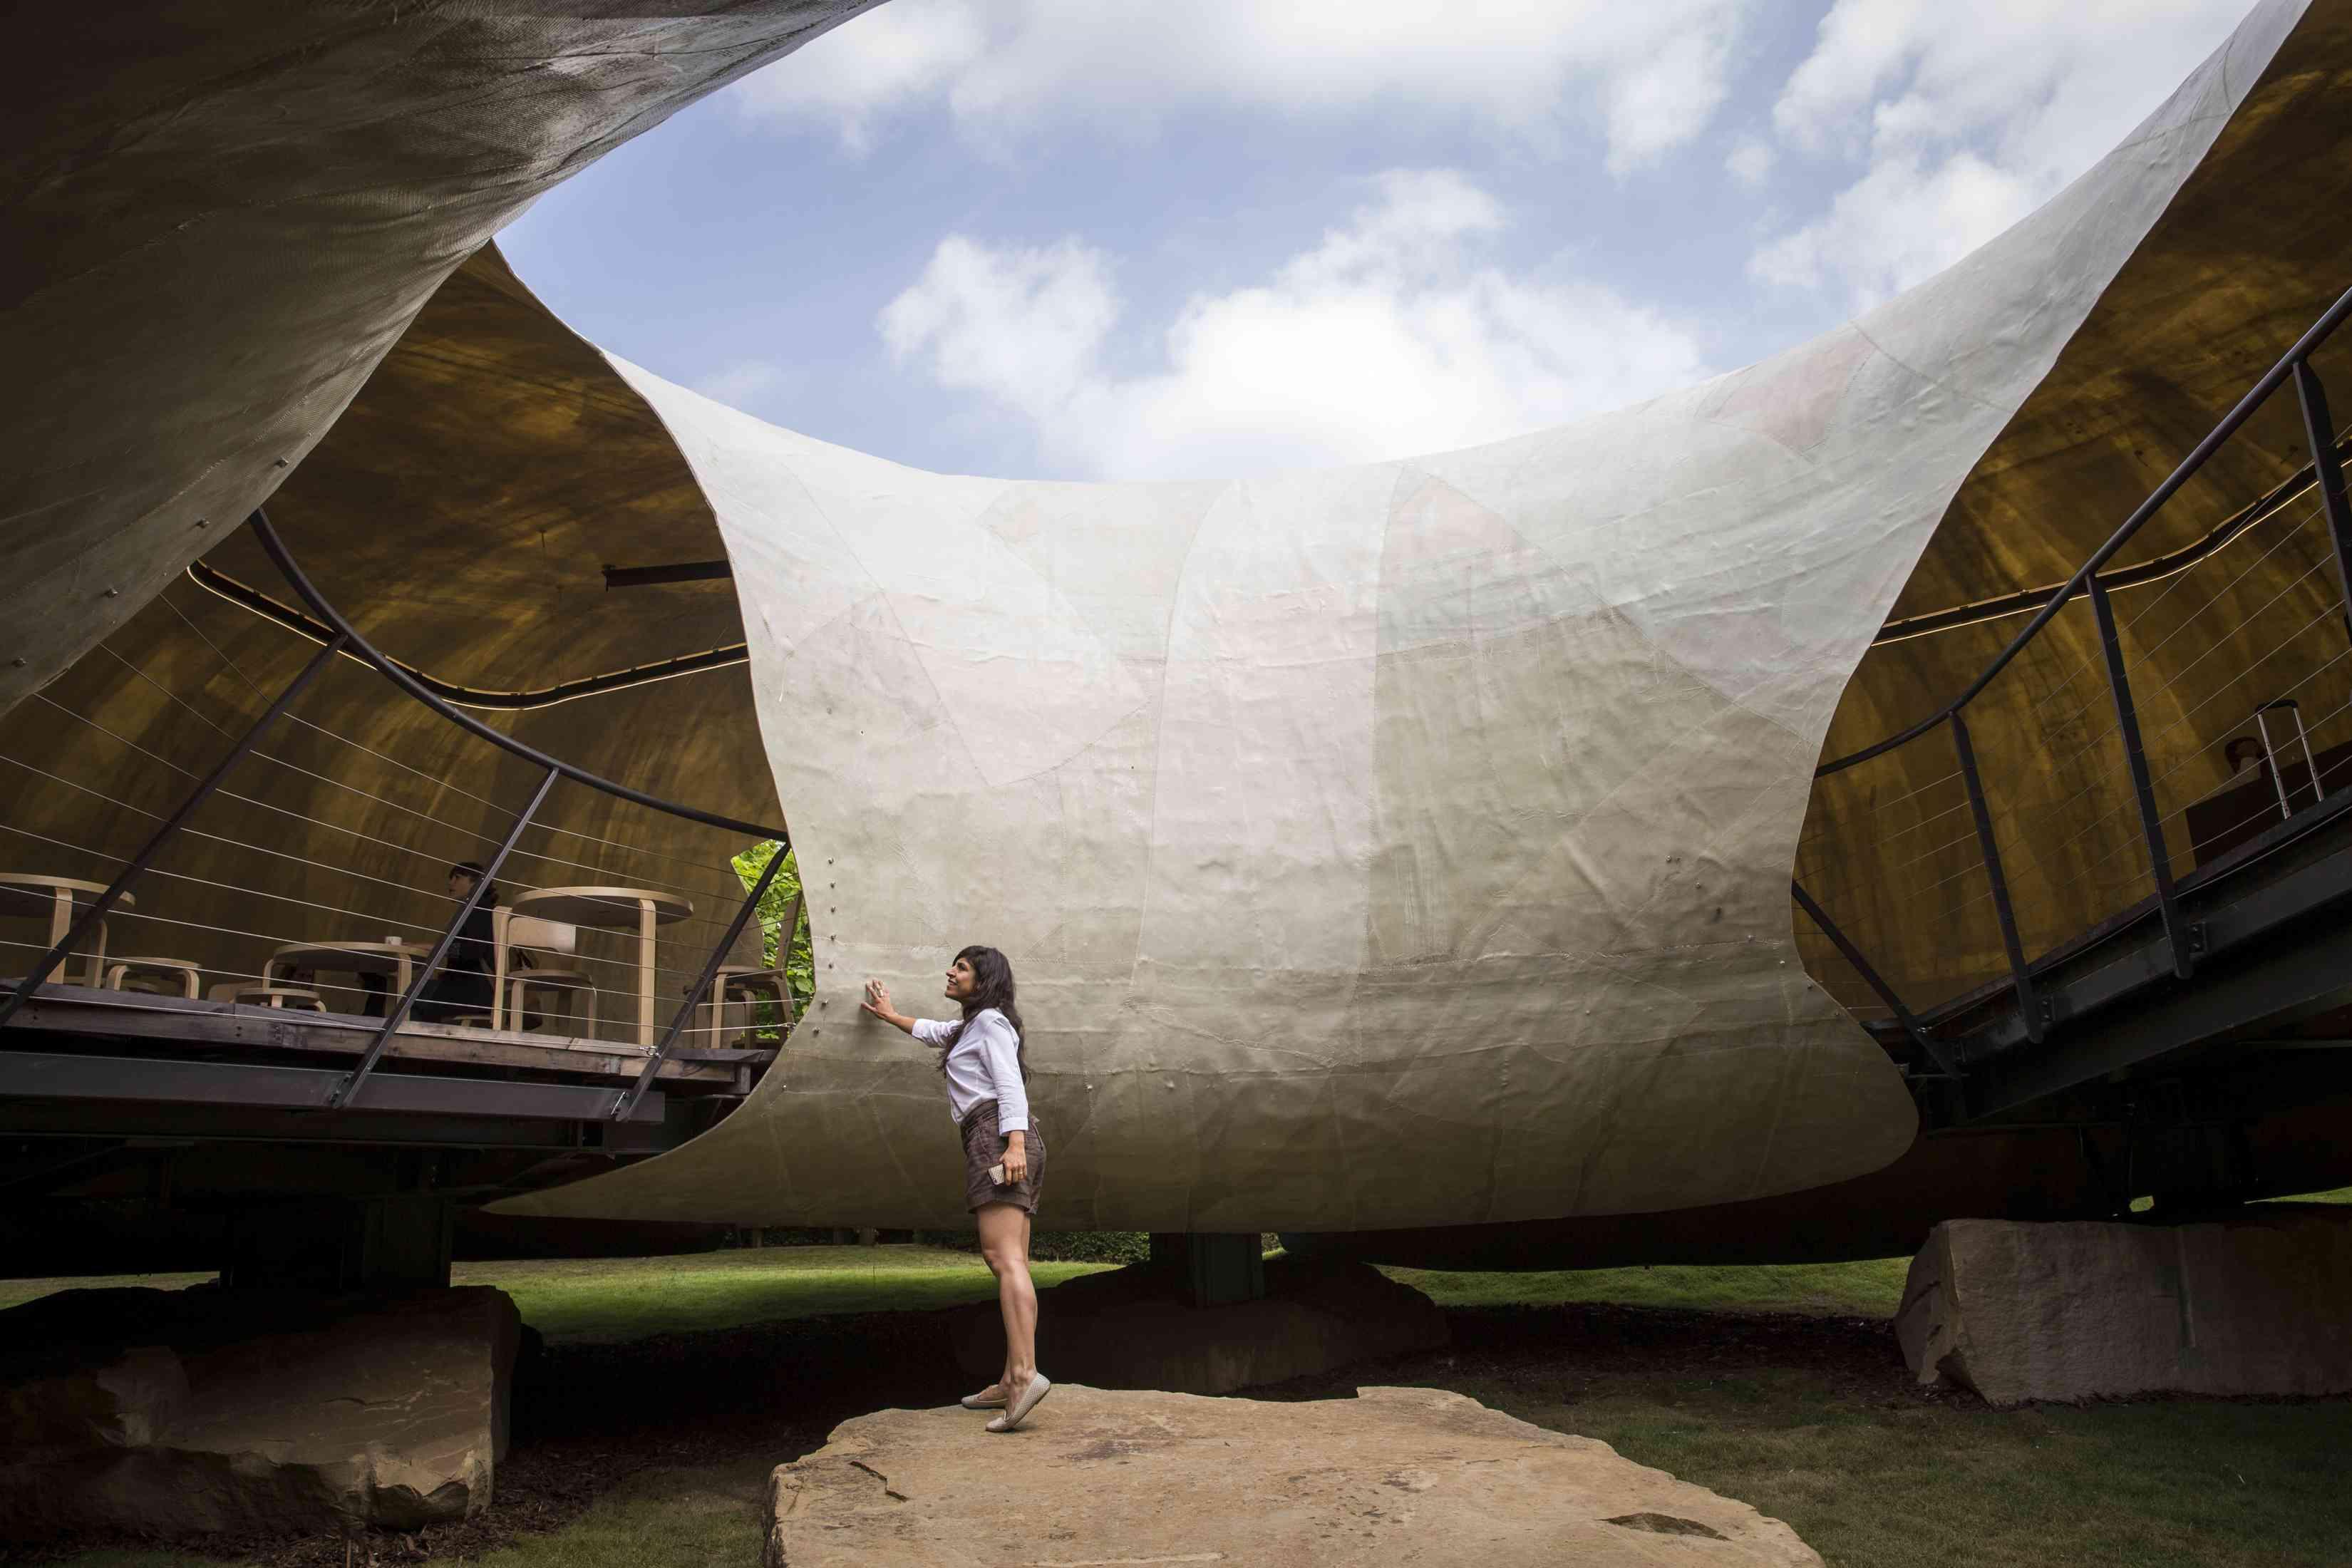 The 2014 Serpentine Pavilion designed by Smiljan Radic in Kensington Gardens on June 24, 2014